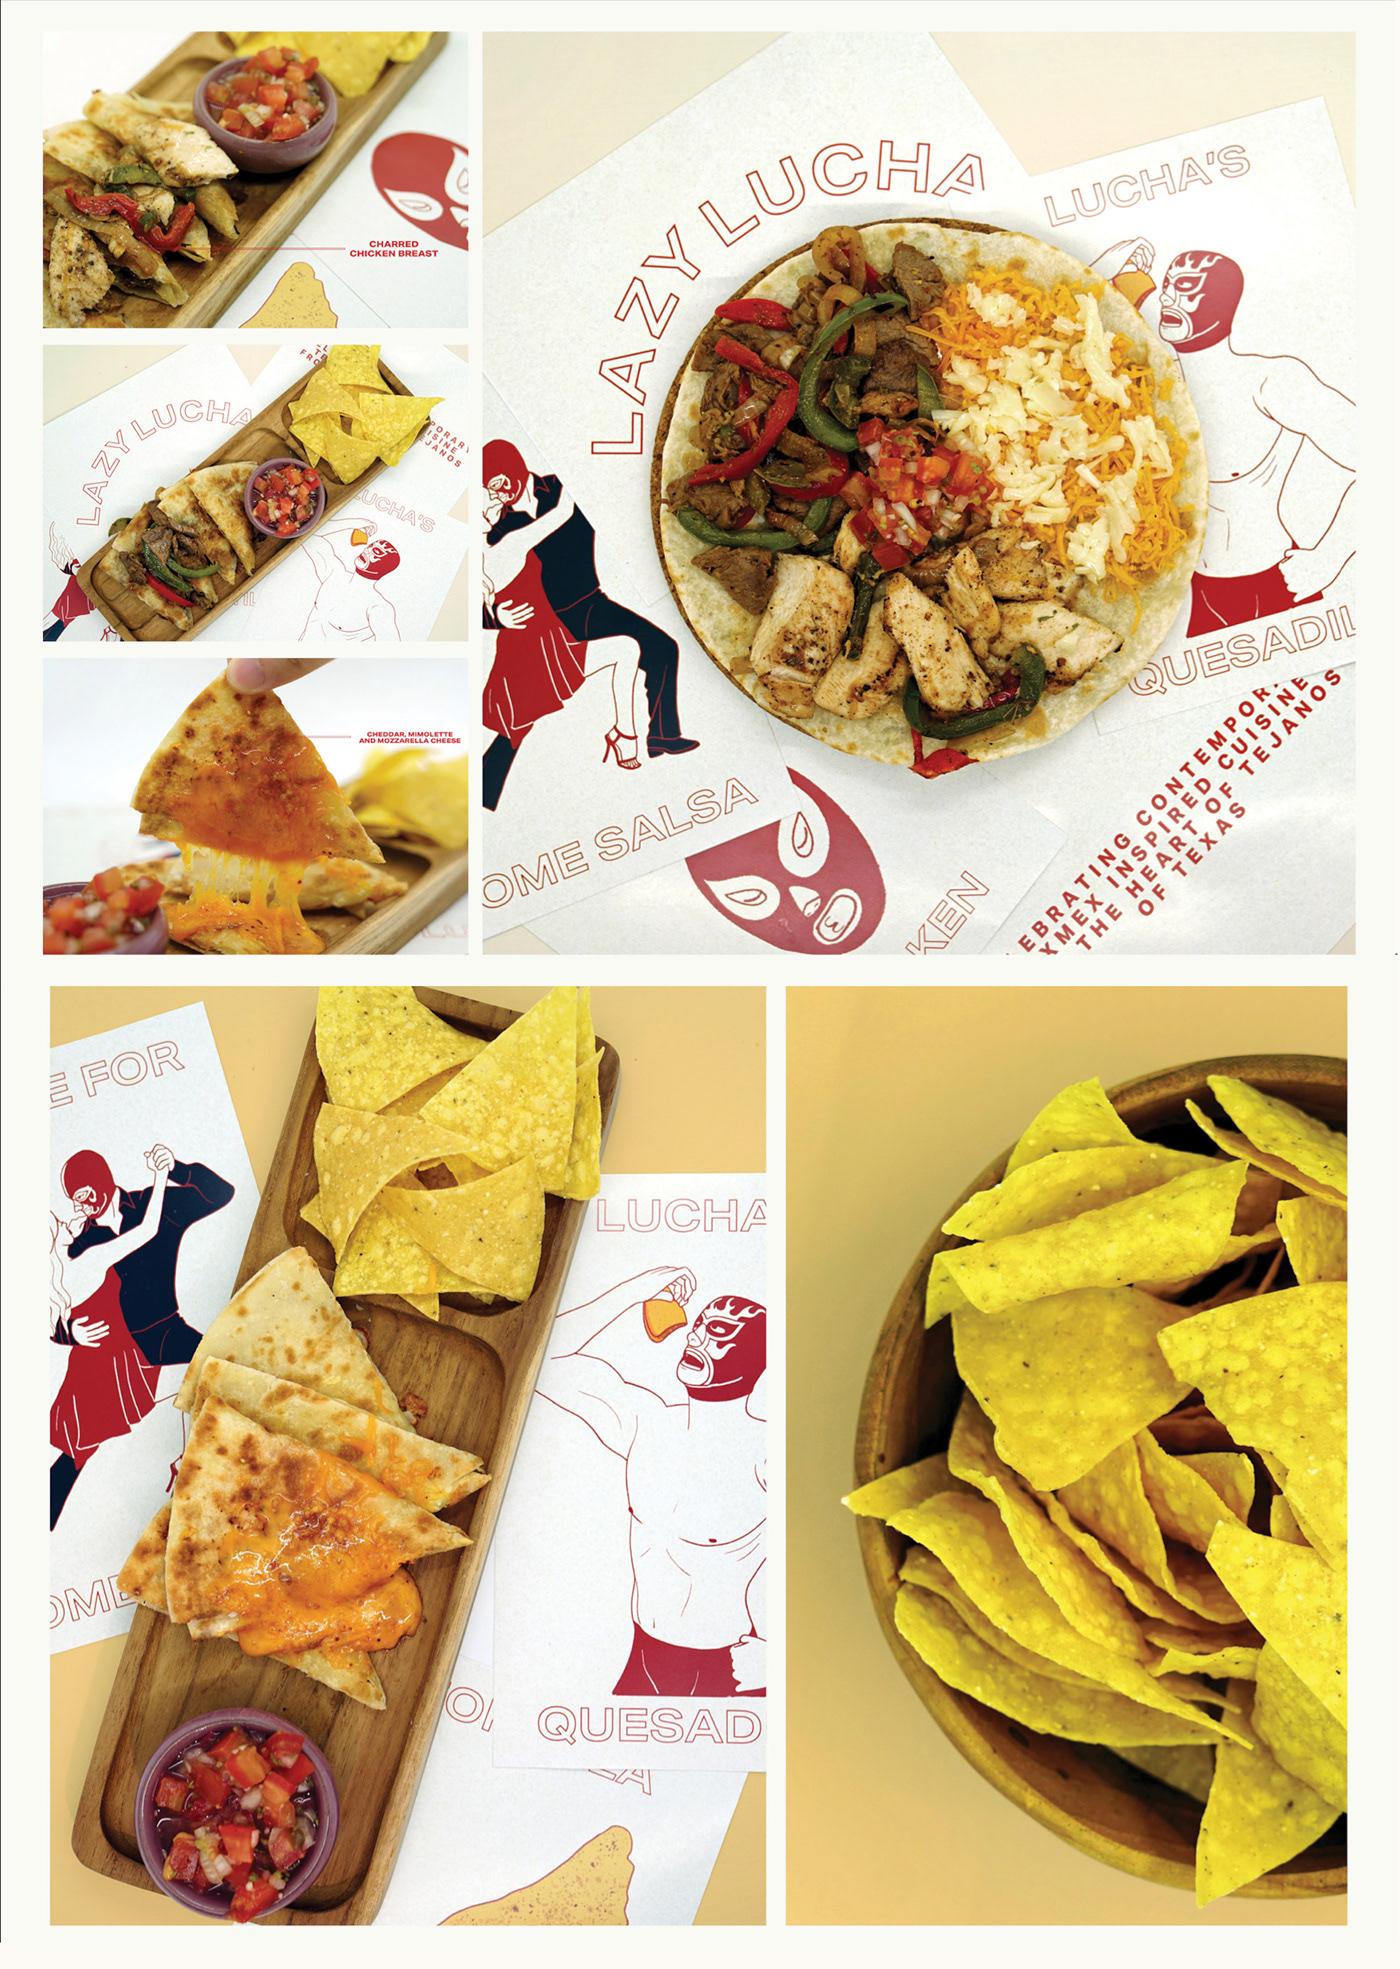 food branding food photography ILLUSTRATION  Mexican Branding mexican restaurant Photography  Restaurant Branding restaurant logo